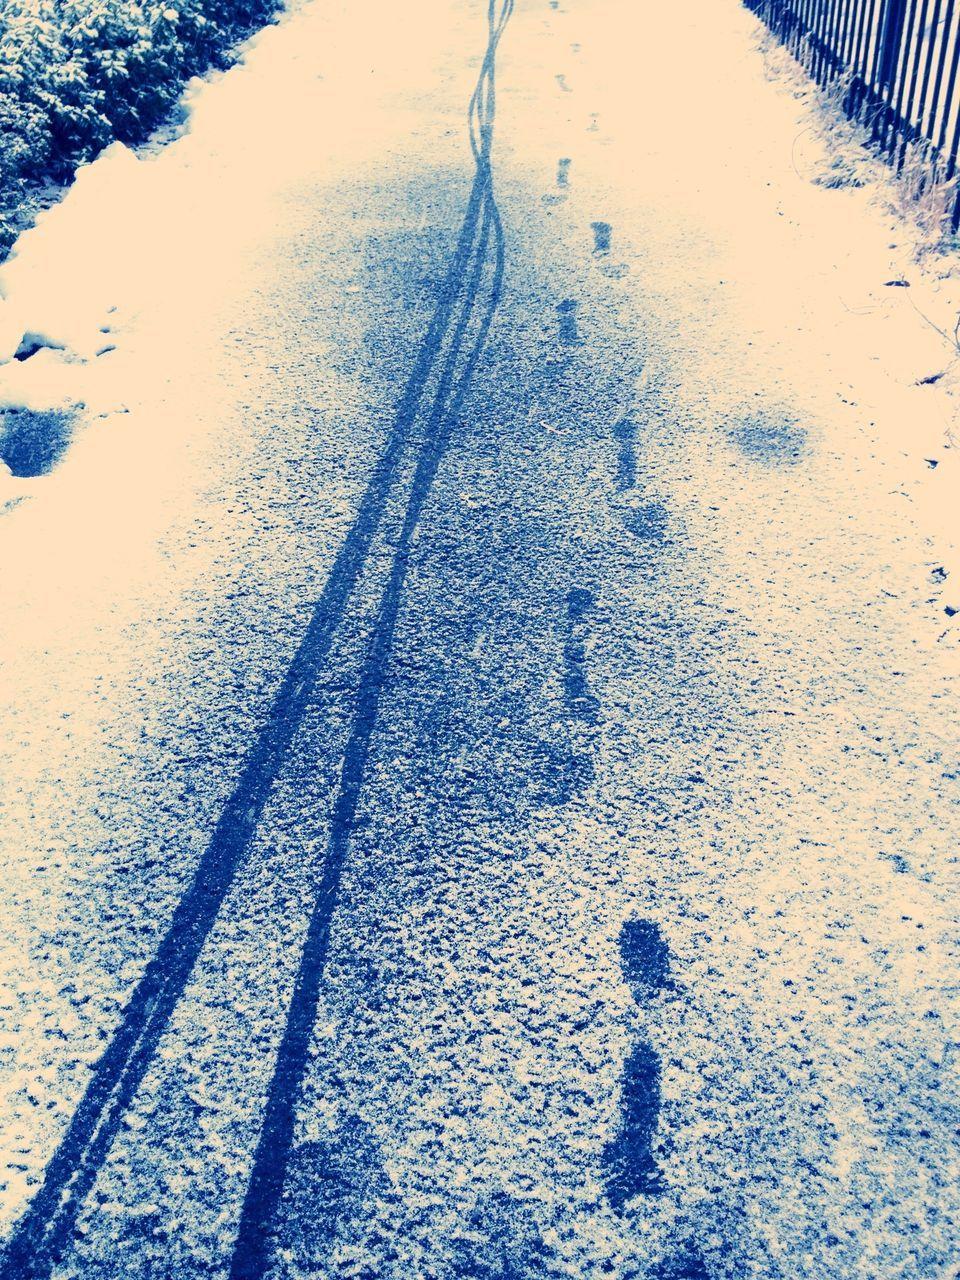 Close-up of empty snowed road